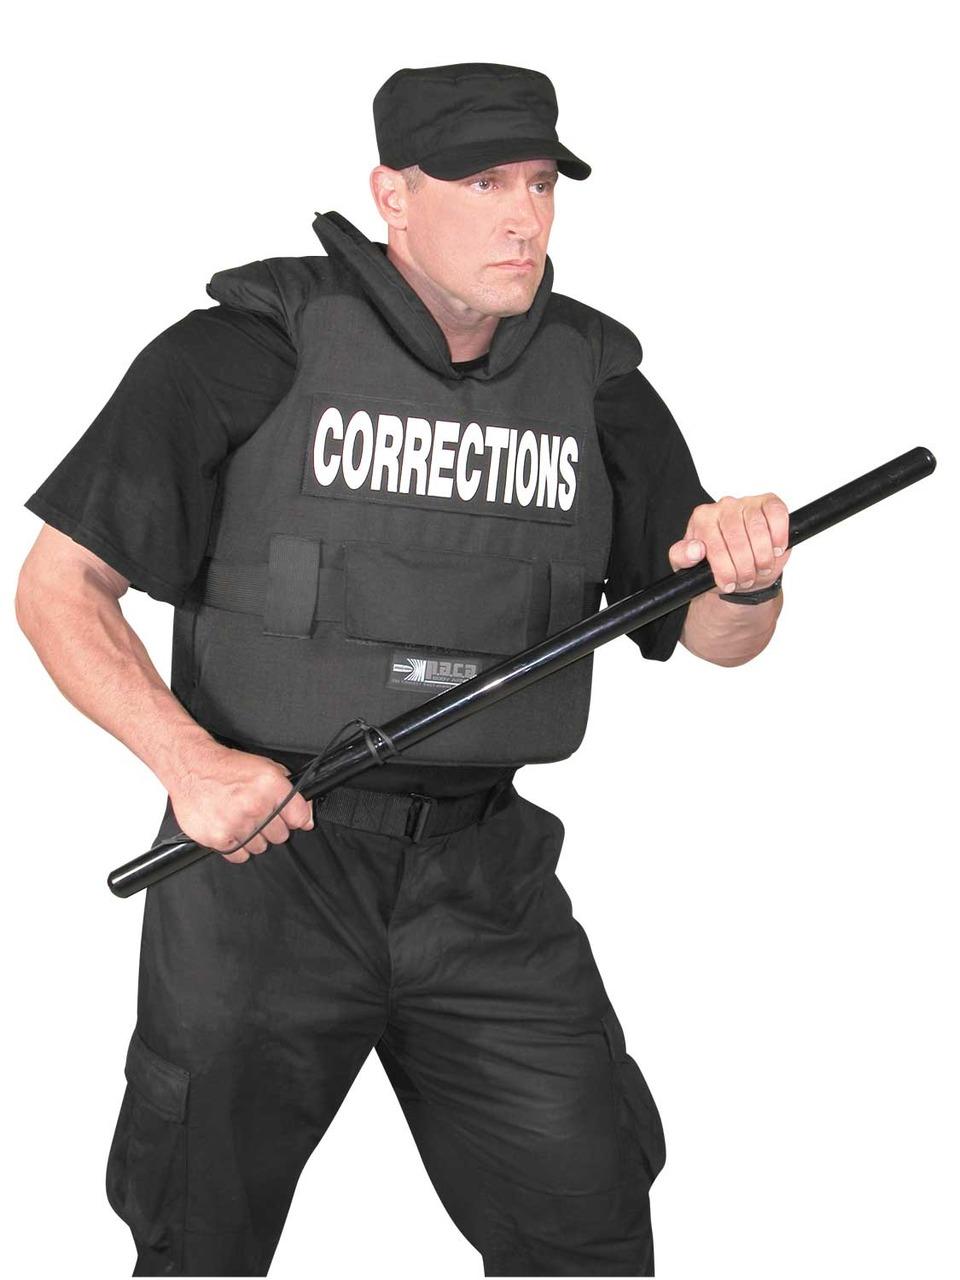 PACA BODY ARMOR Thrust Guard corrections armor in Body Armor